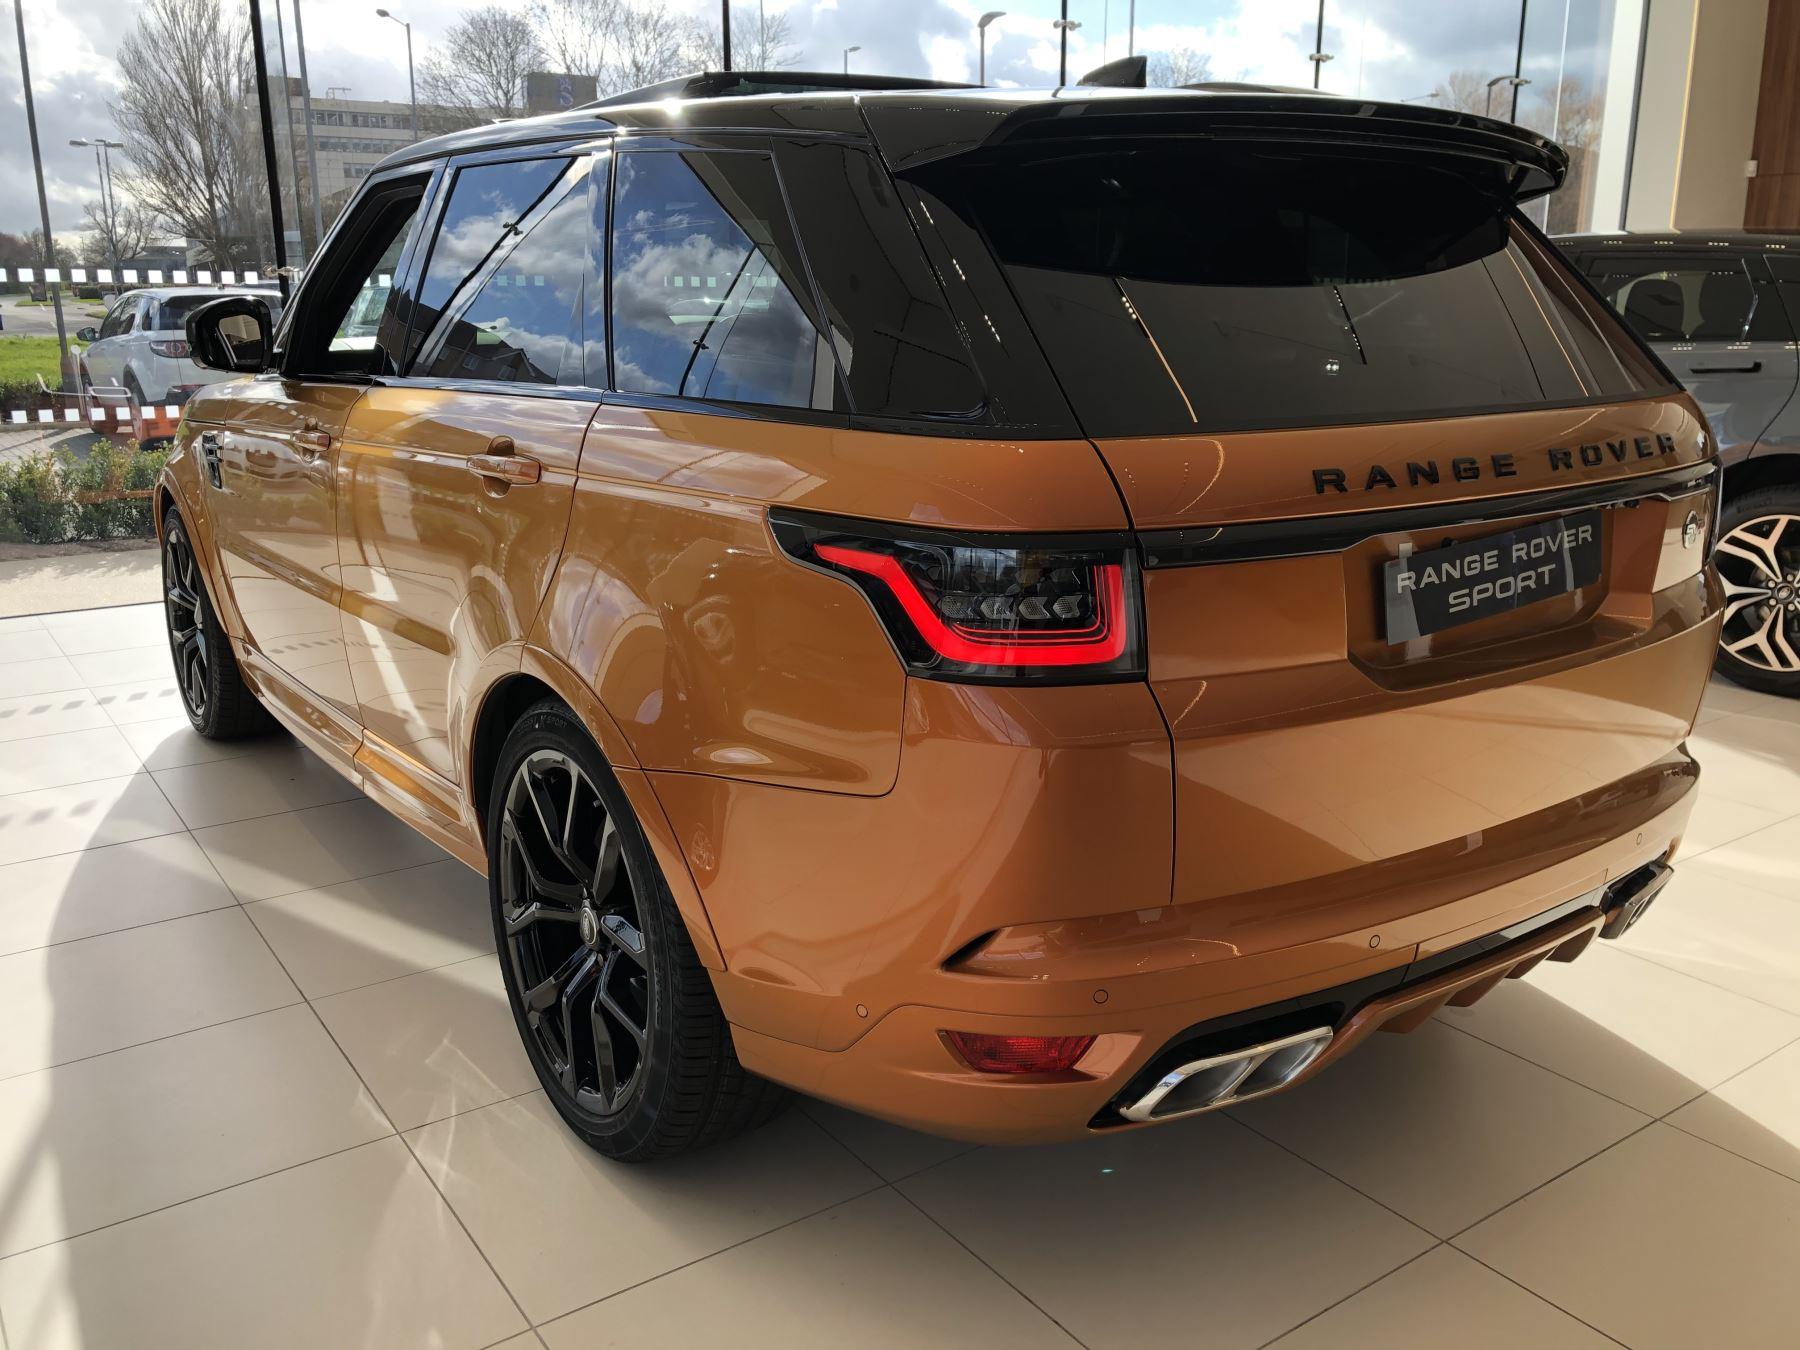 Land Rover Range Rover Sport 5.0 P575 S/C SVR image 7